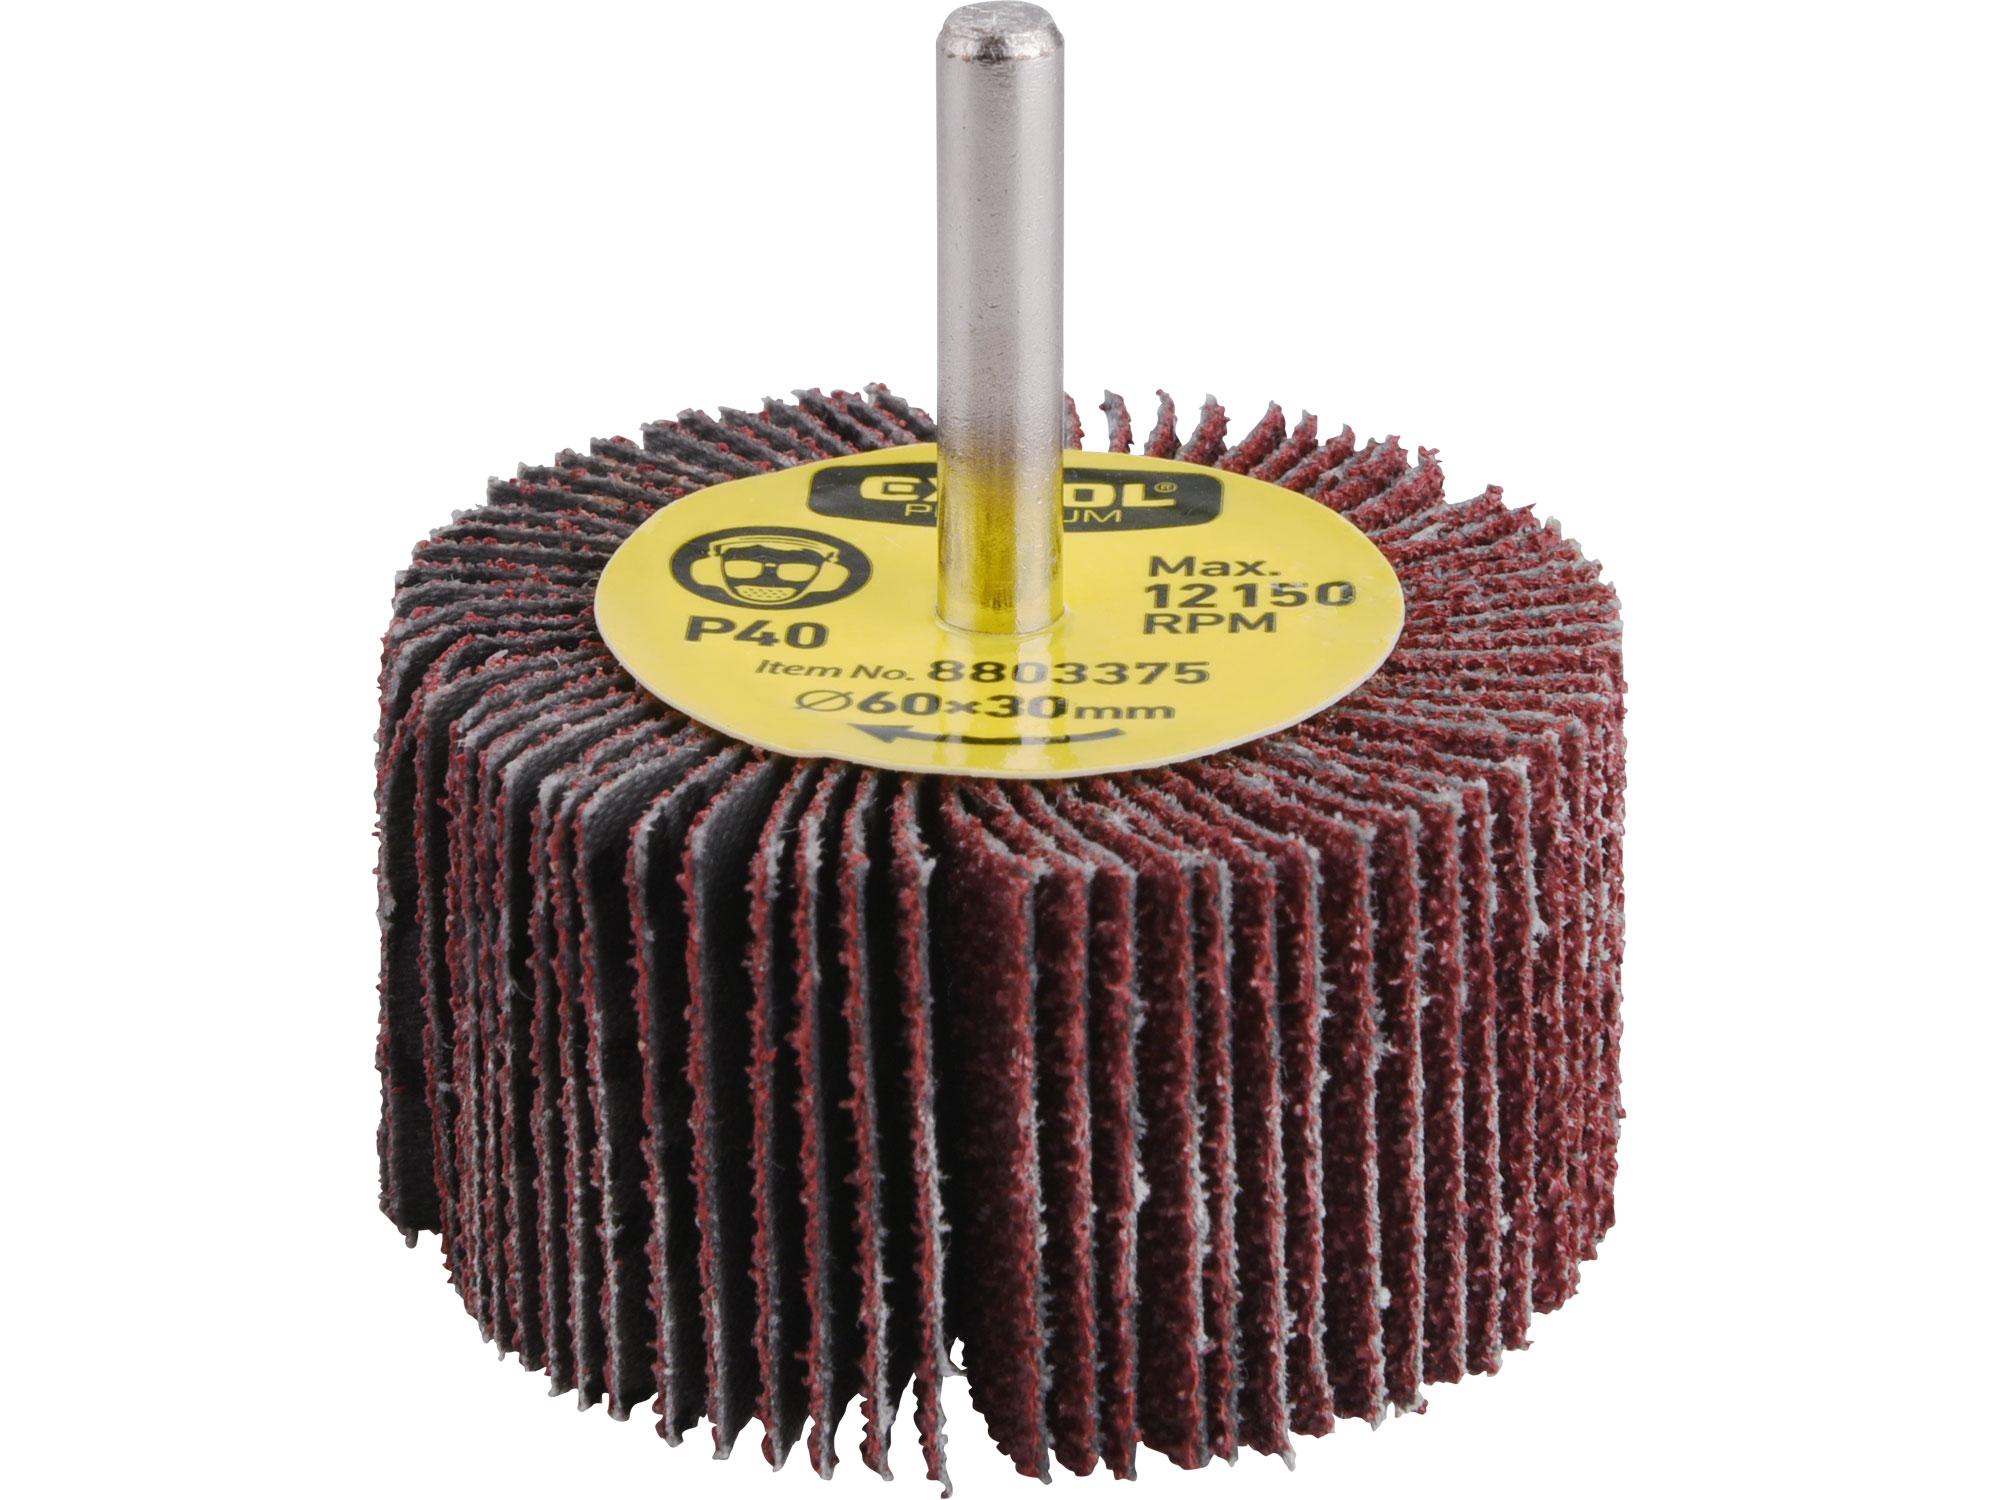 Sanding Flap Wheel dia60x30x6mm shank, P60